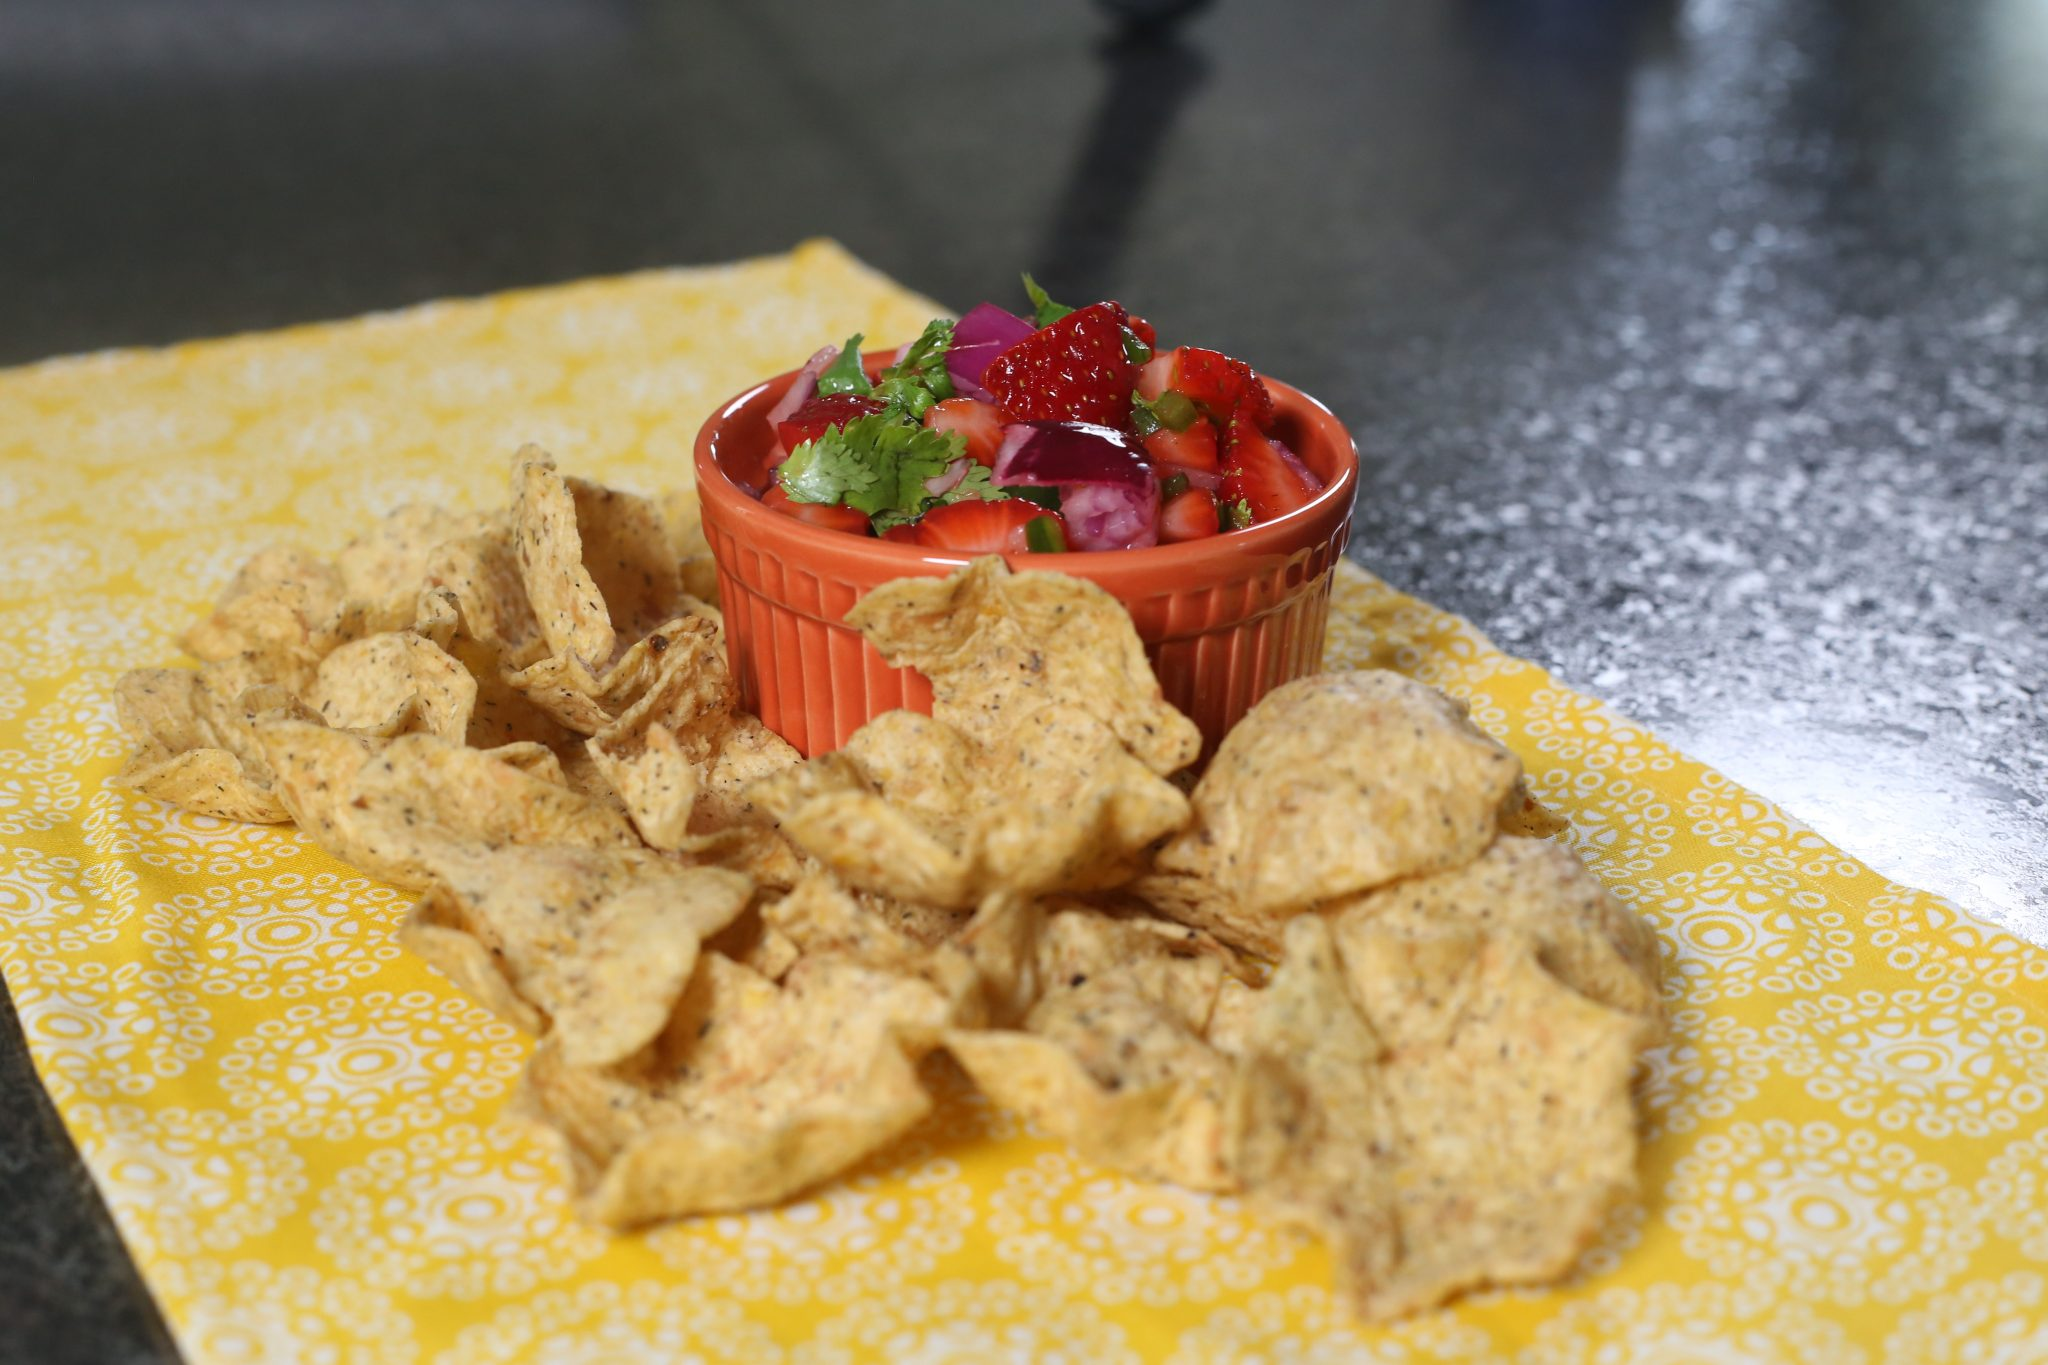 salsa, chips, brown cutting board